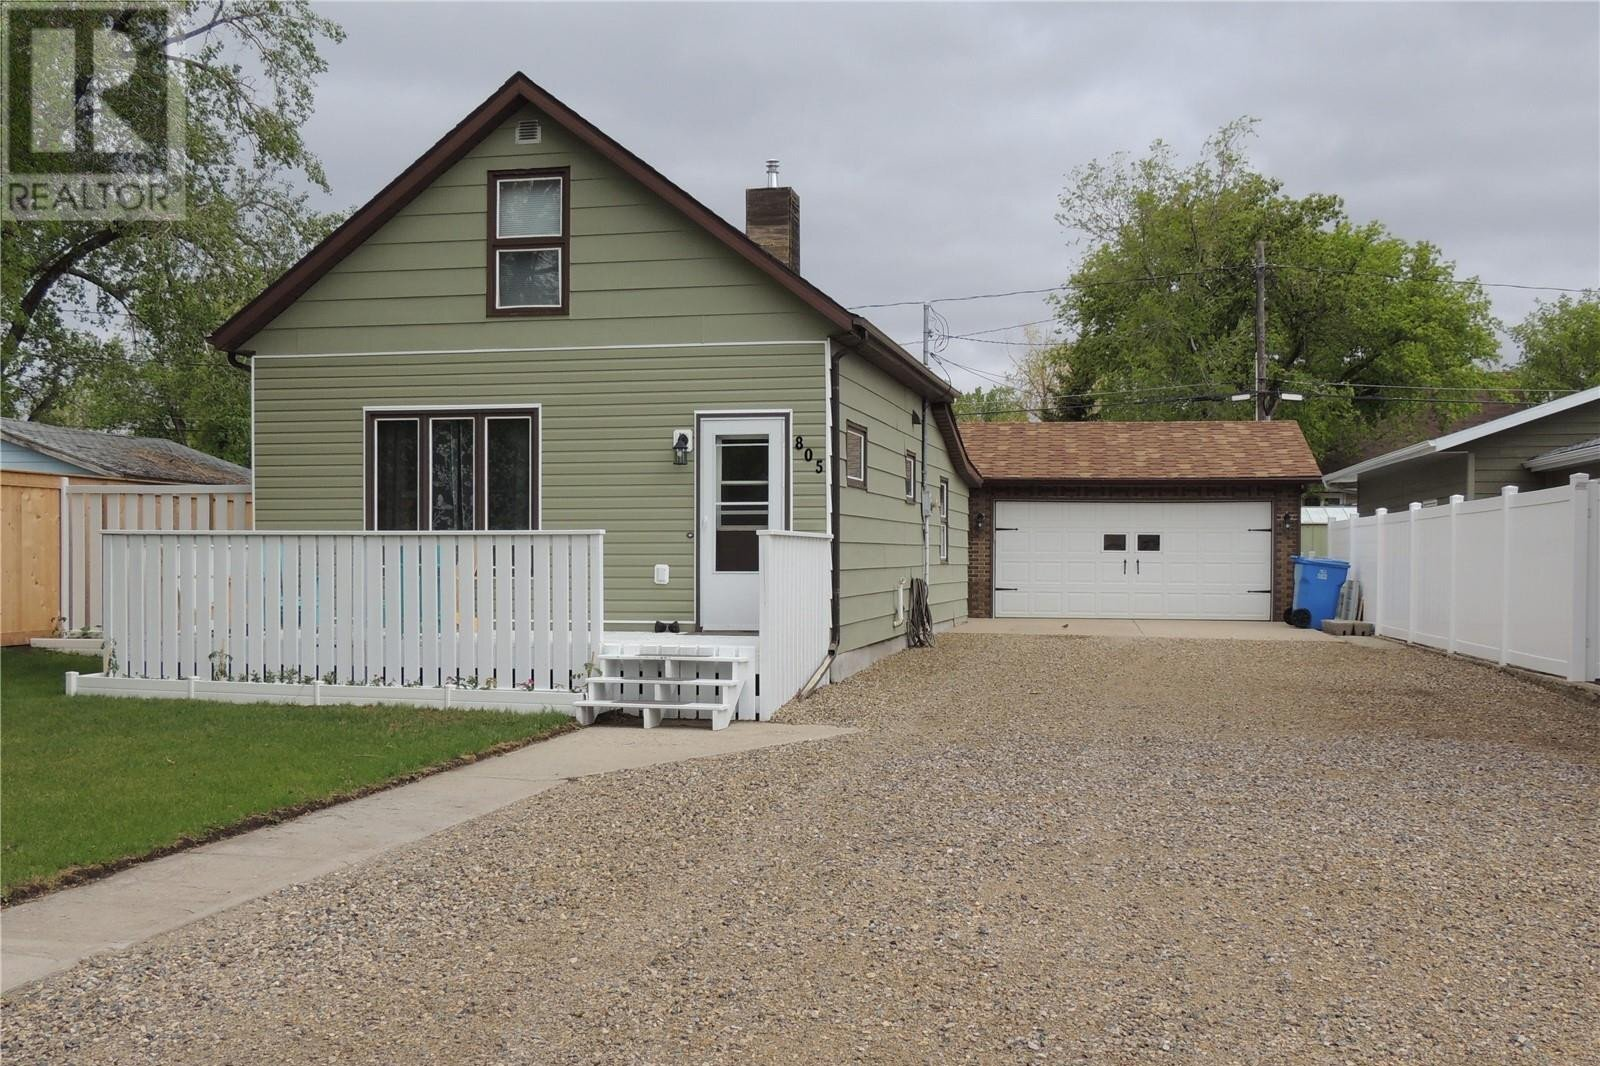 House for sale at 805 George St Estevan Saskatchewan - MLS: SK834105